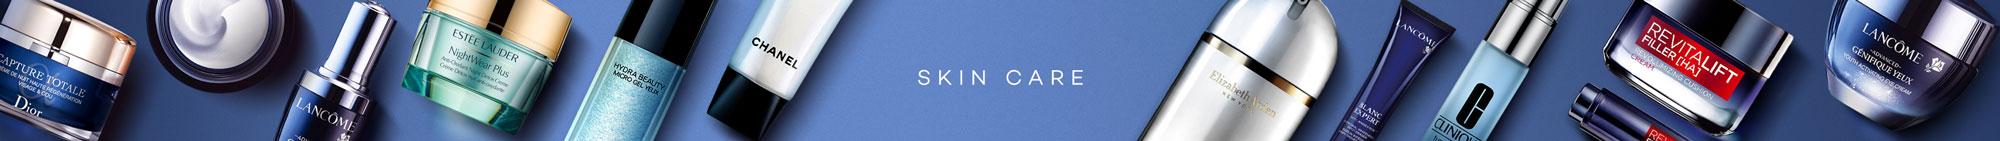 promo produk perawatan kulit